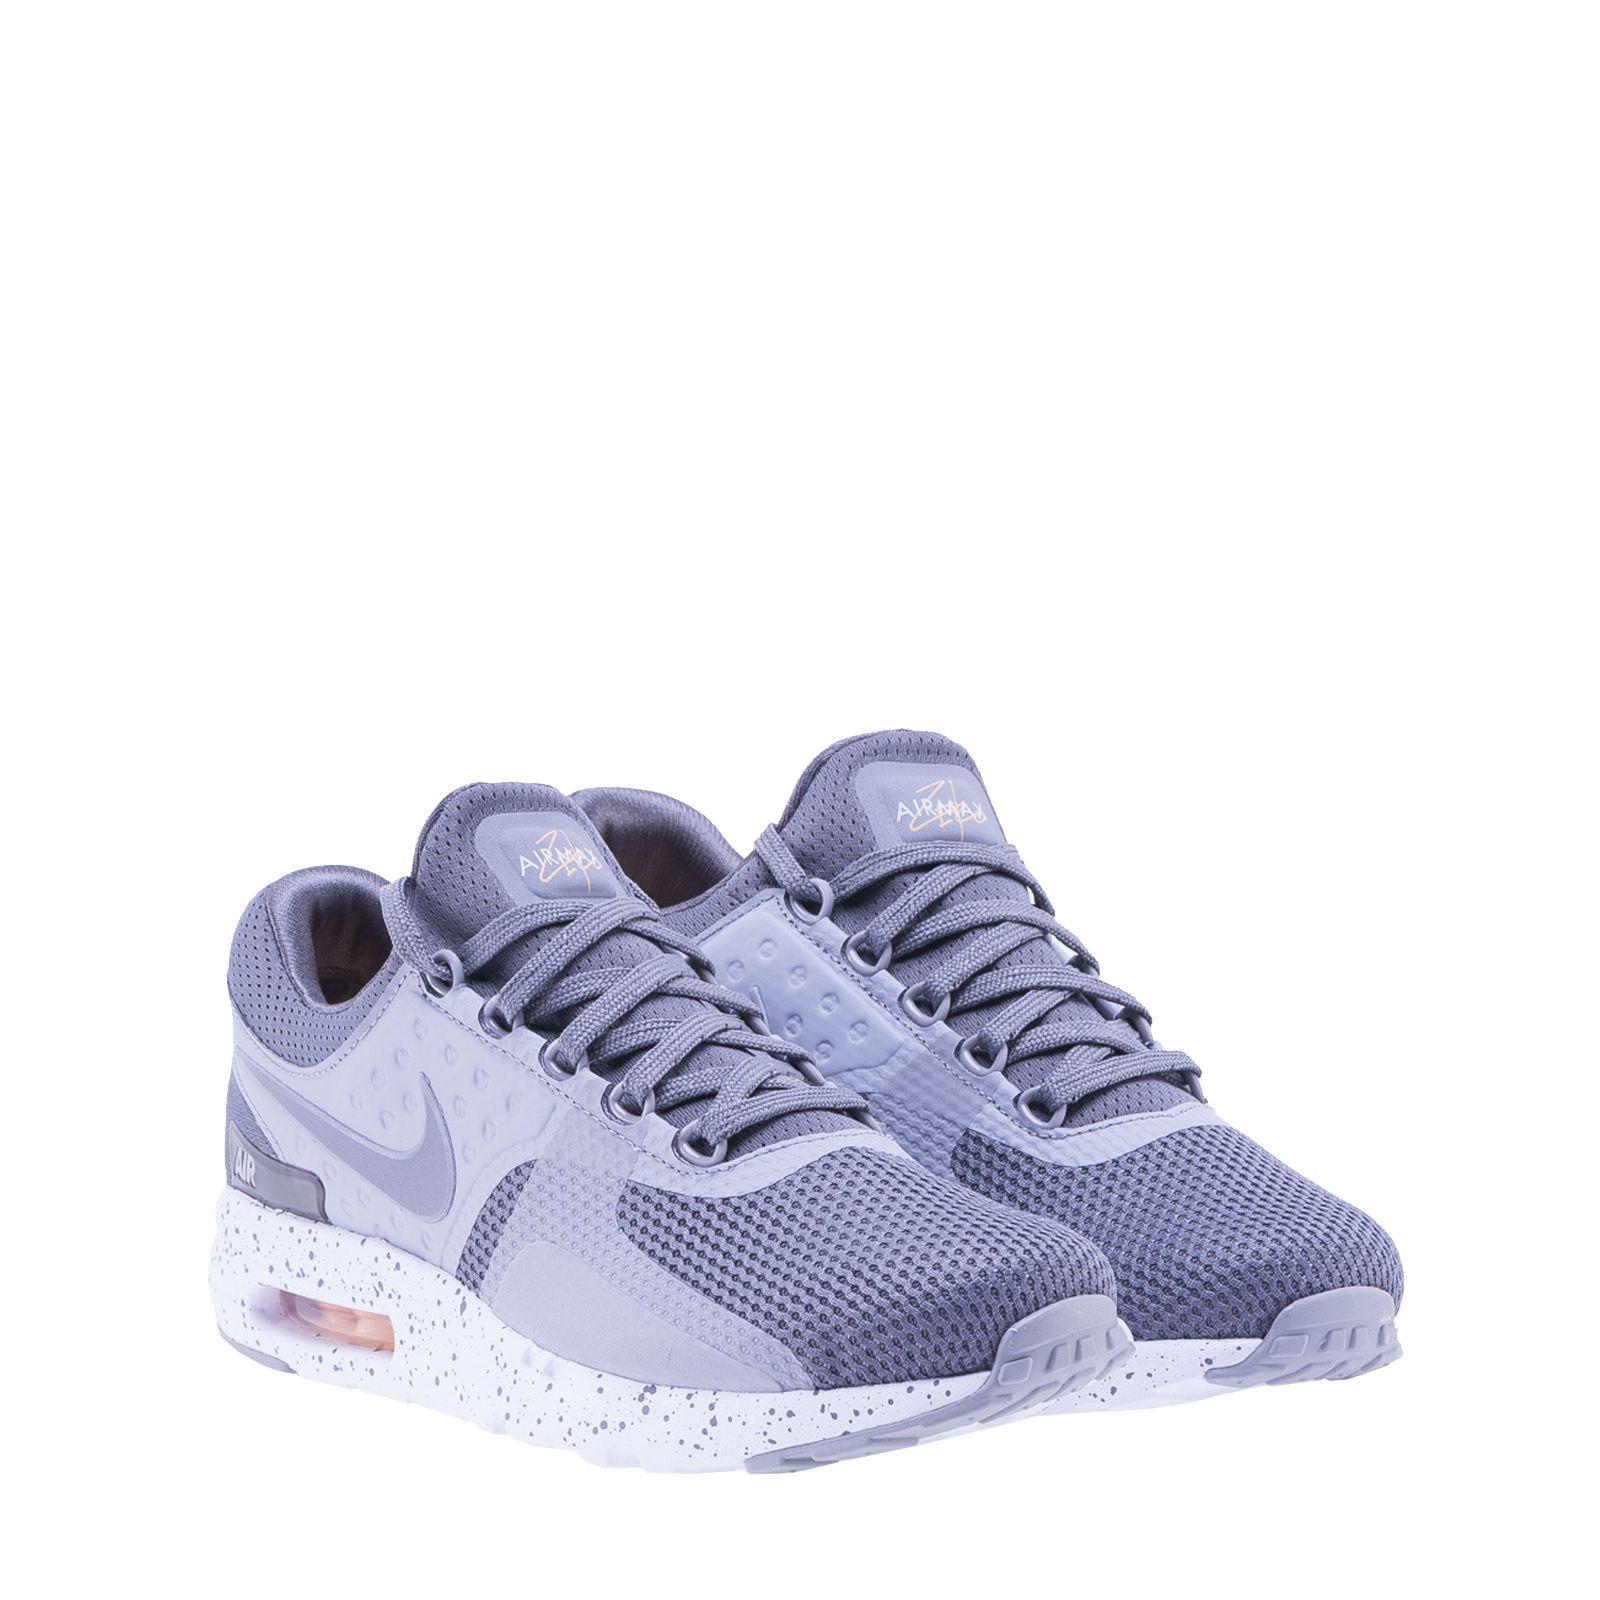 Nike Air Max Zero Premium Trainers